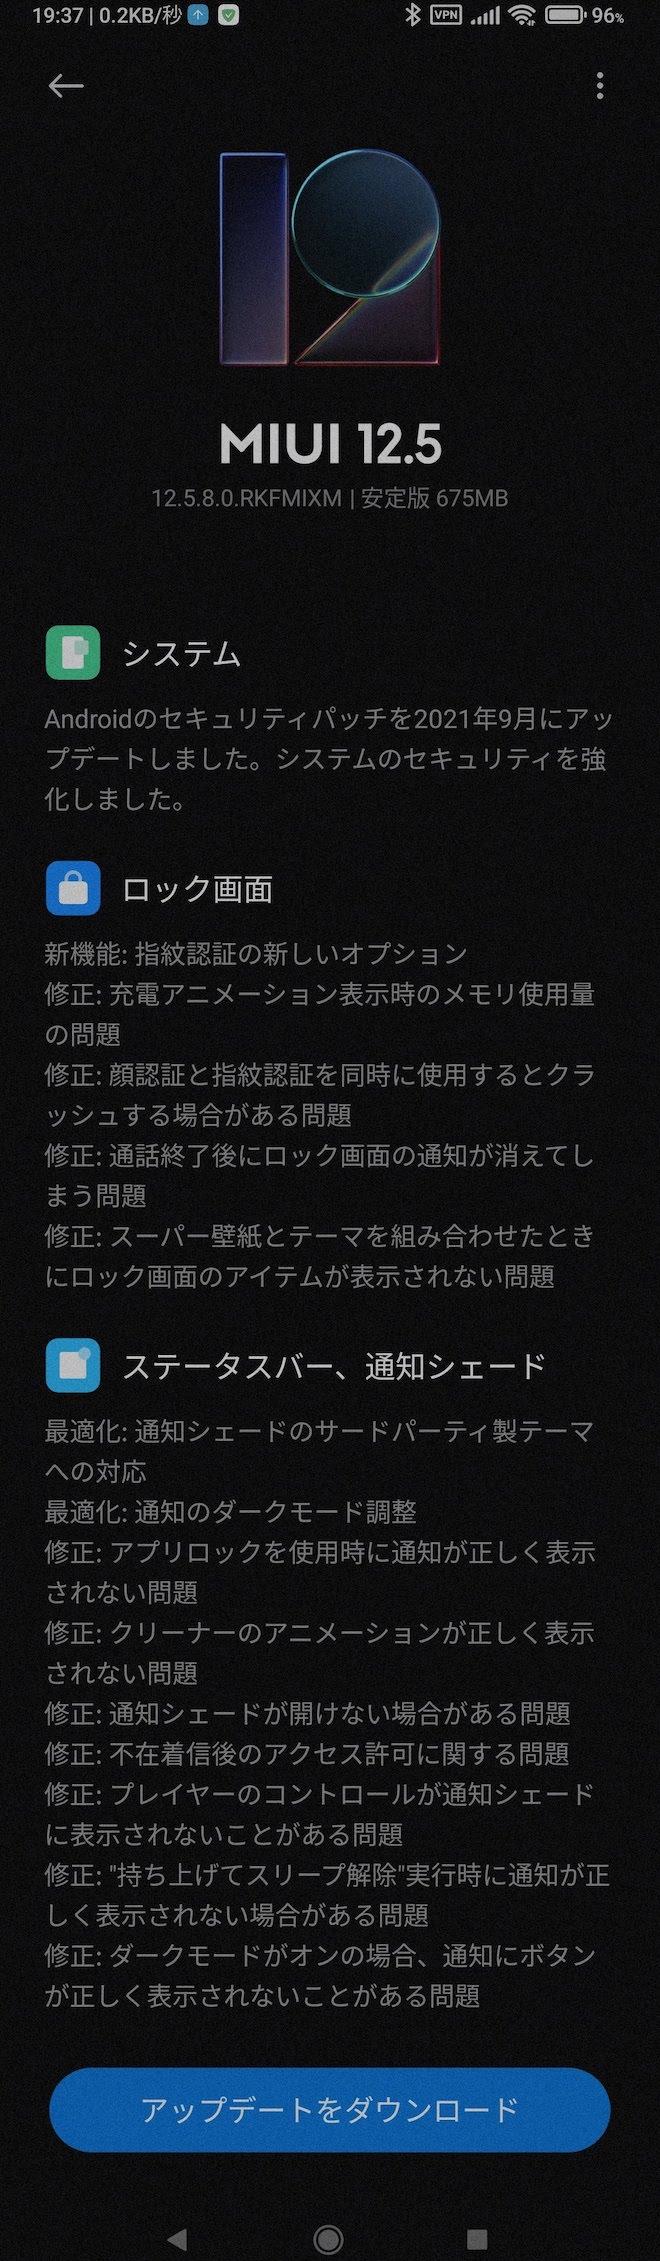 Redmi Note 10 Proのアップデート通知